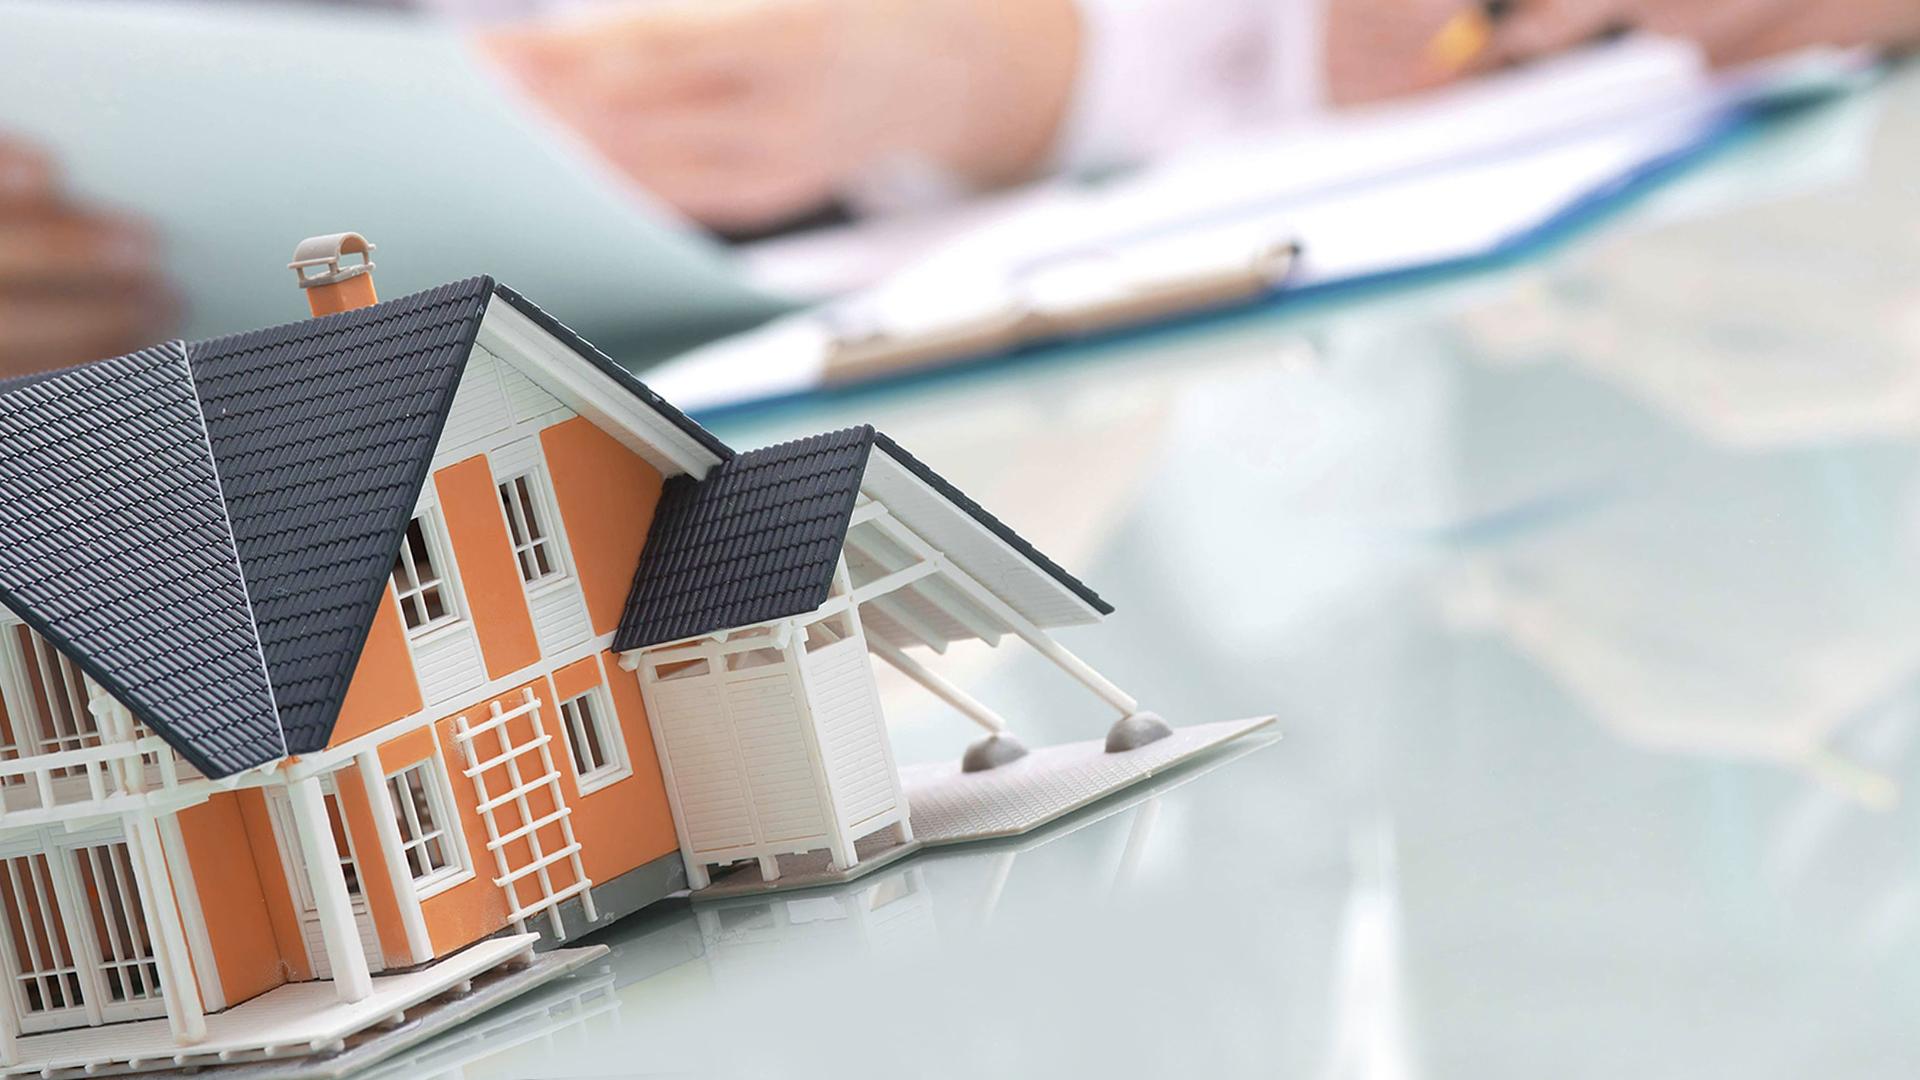 Срочно нужен займ под залог недвижимости